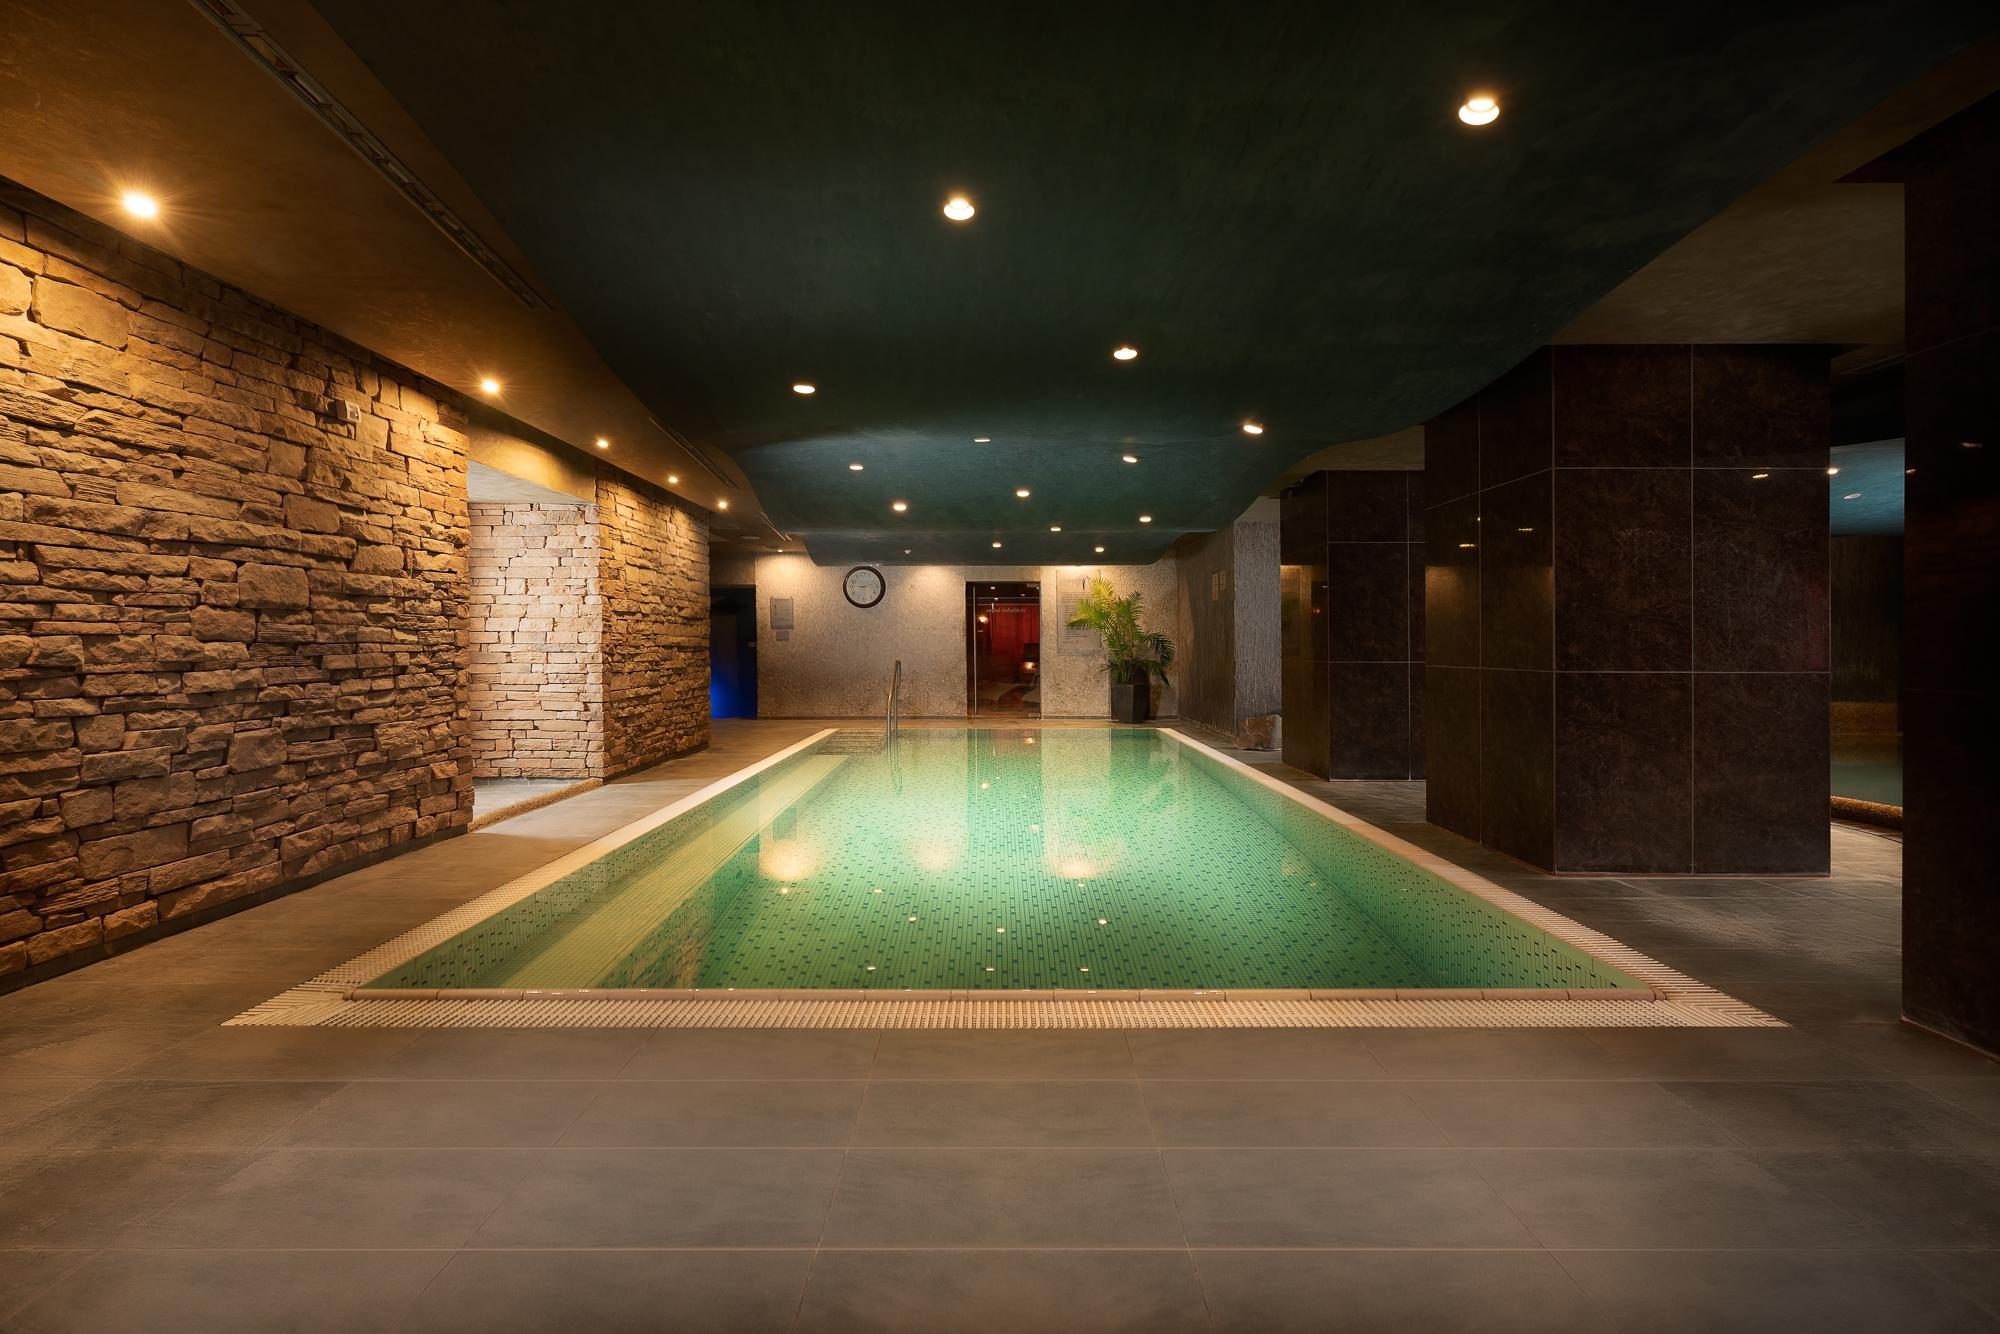 https://cms.satur.sk/data/imgs/tour_image/orig/hotel_termal_vyhne-2-1802498.jpg